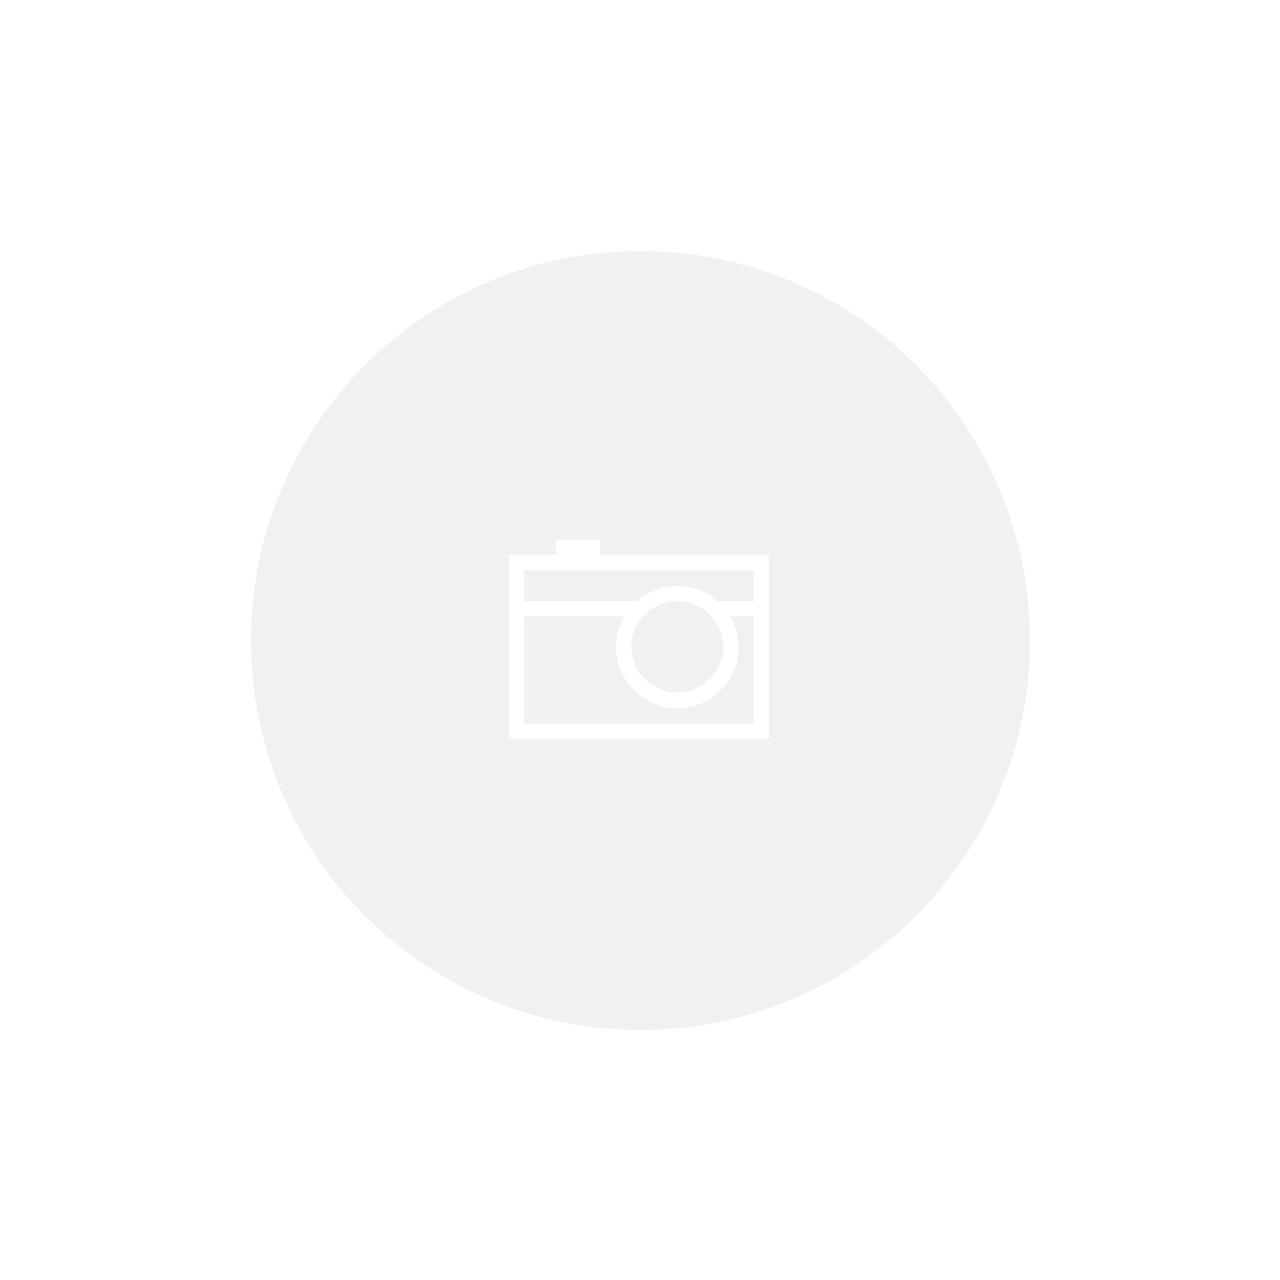 Placa de Vídeo Xfx AMD Radeon Rx 580 Oc+ Gts Edition 8gb Ddr5 1386mhz Rx-580p8dfd6